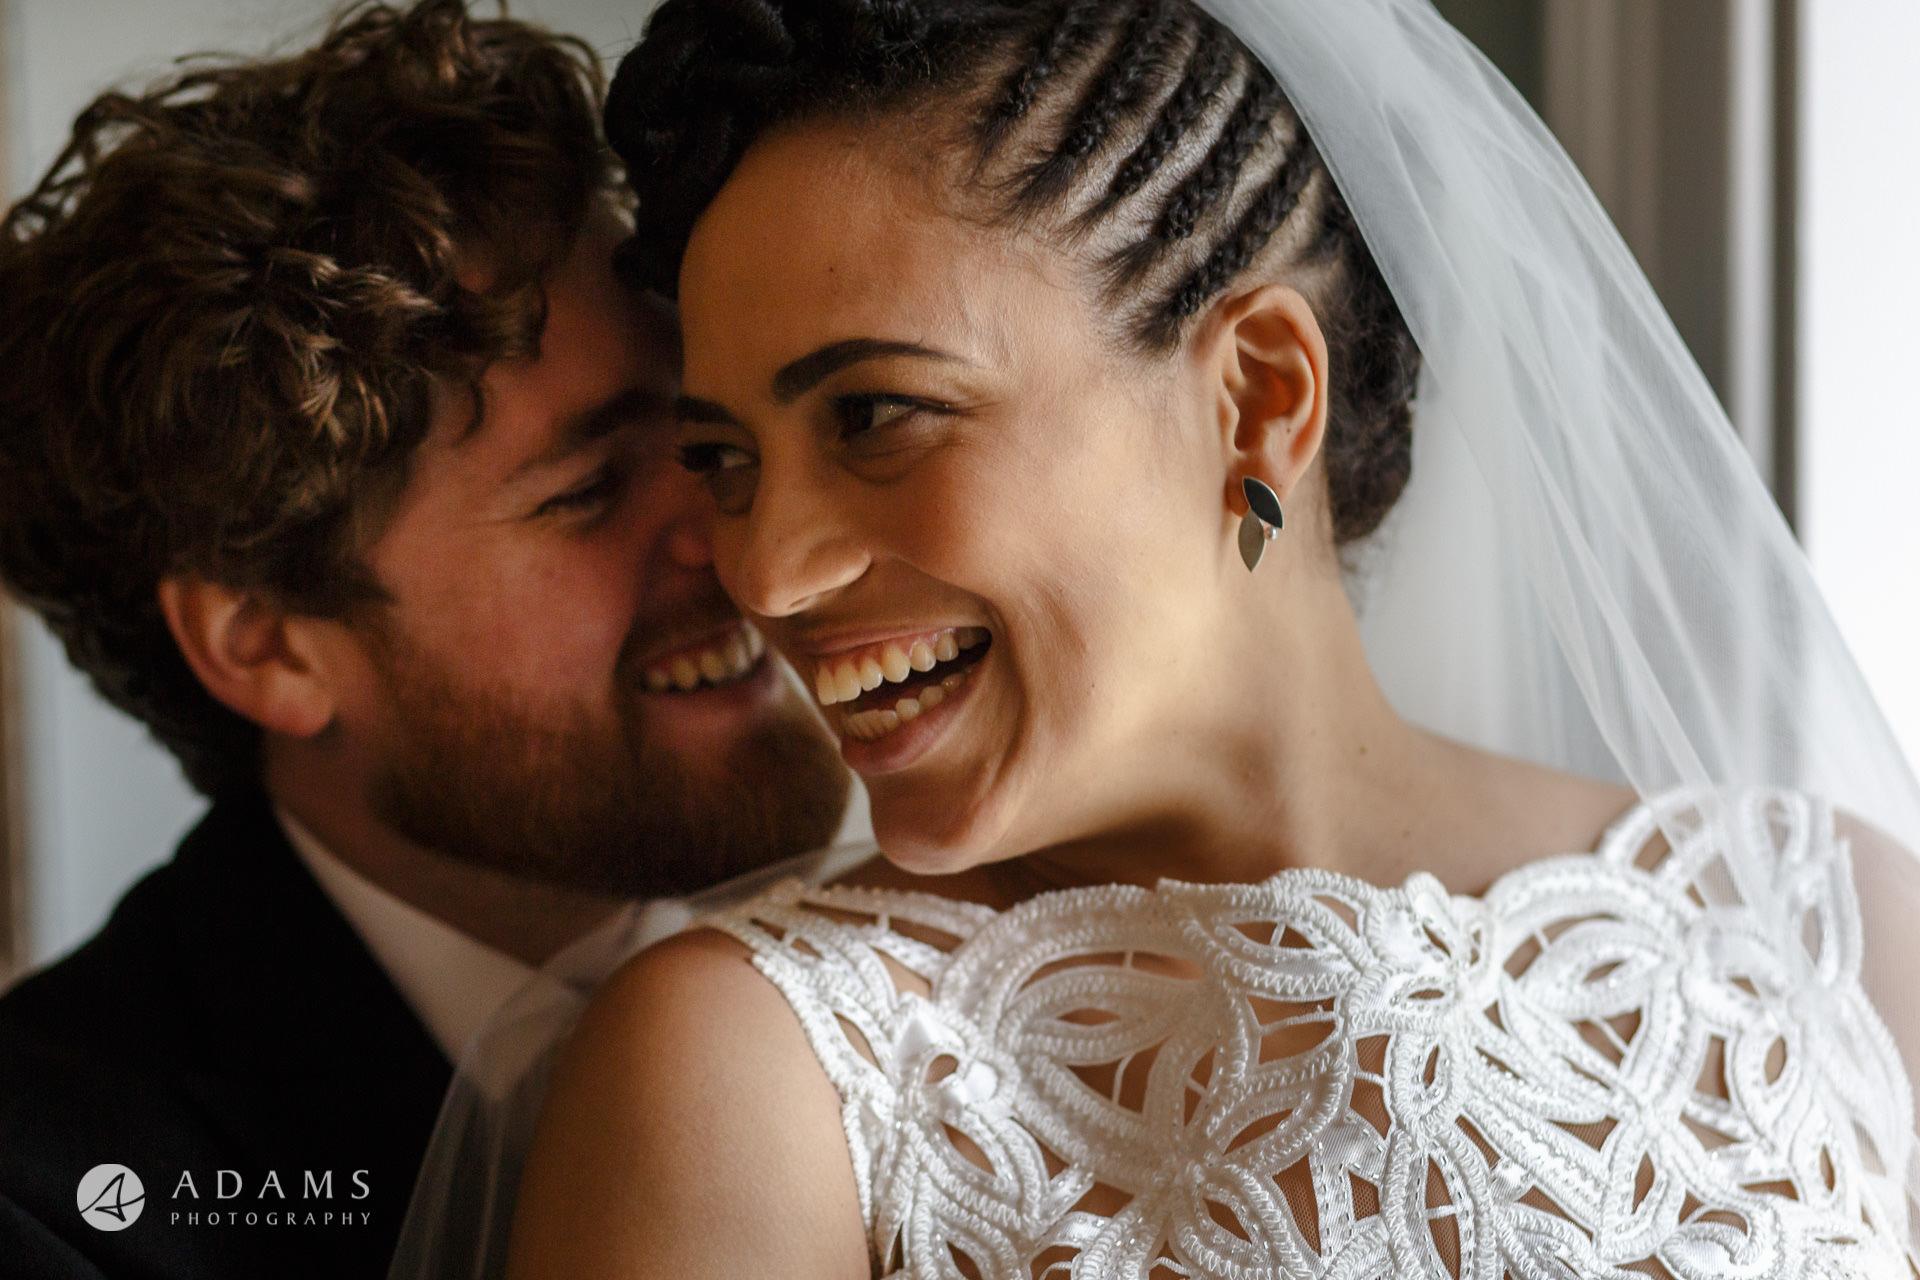 Morden Hall Wedding photo great smile on both bride and groom